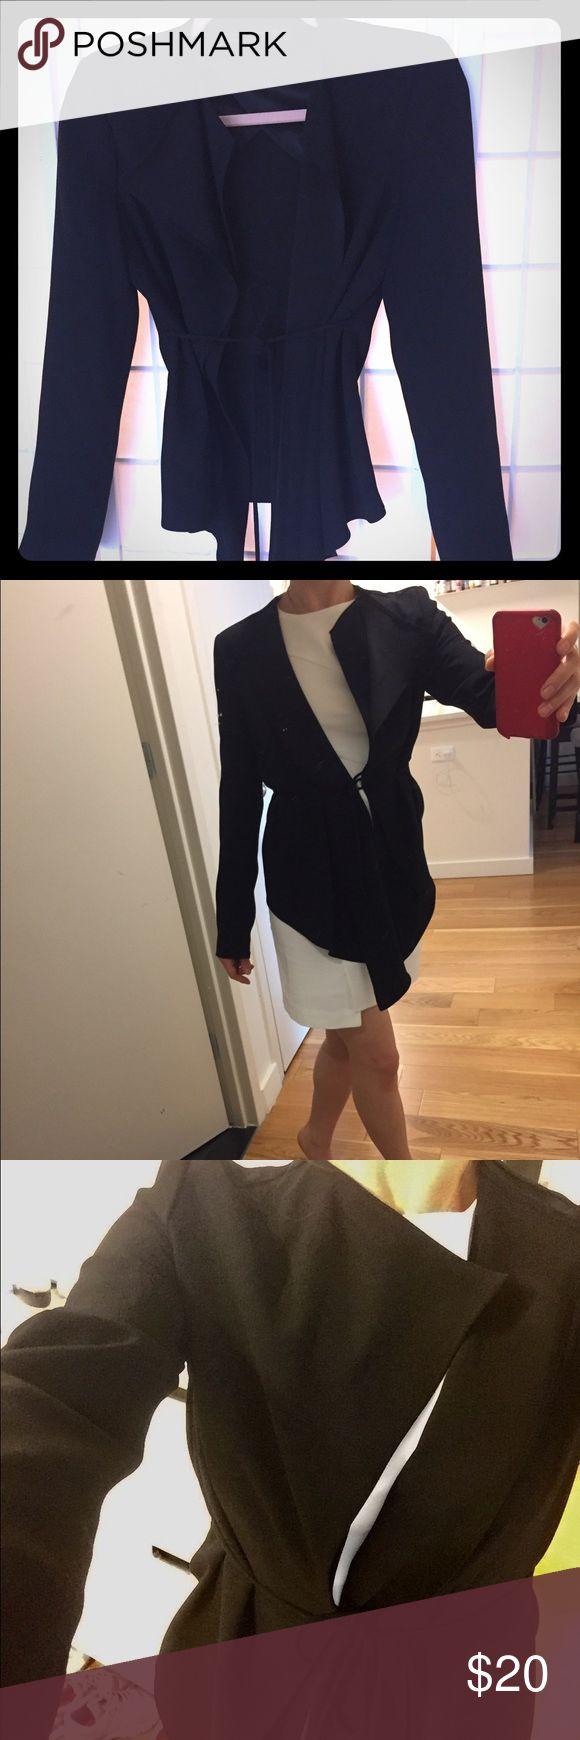 Jacket Asymmetrical light black jacket. Great condition Zara Other